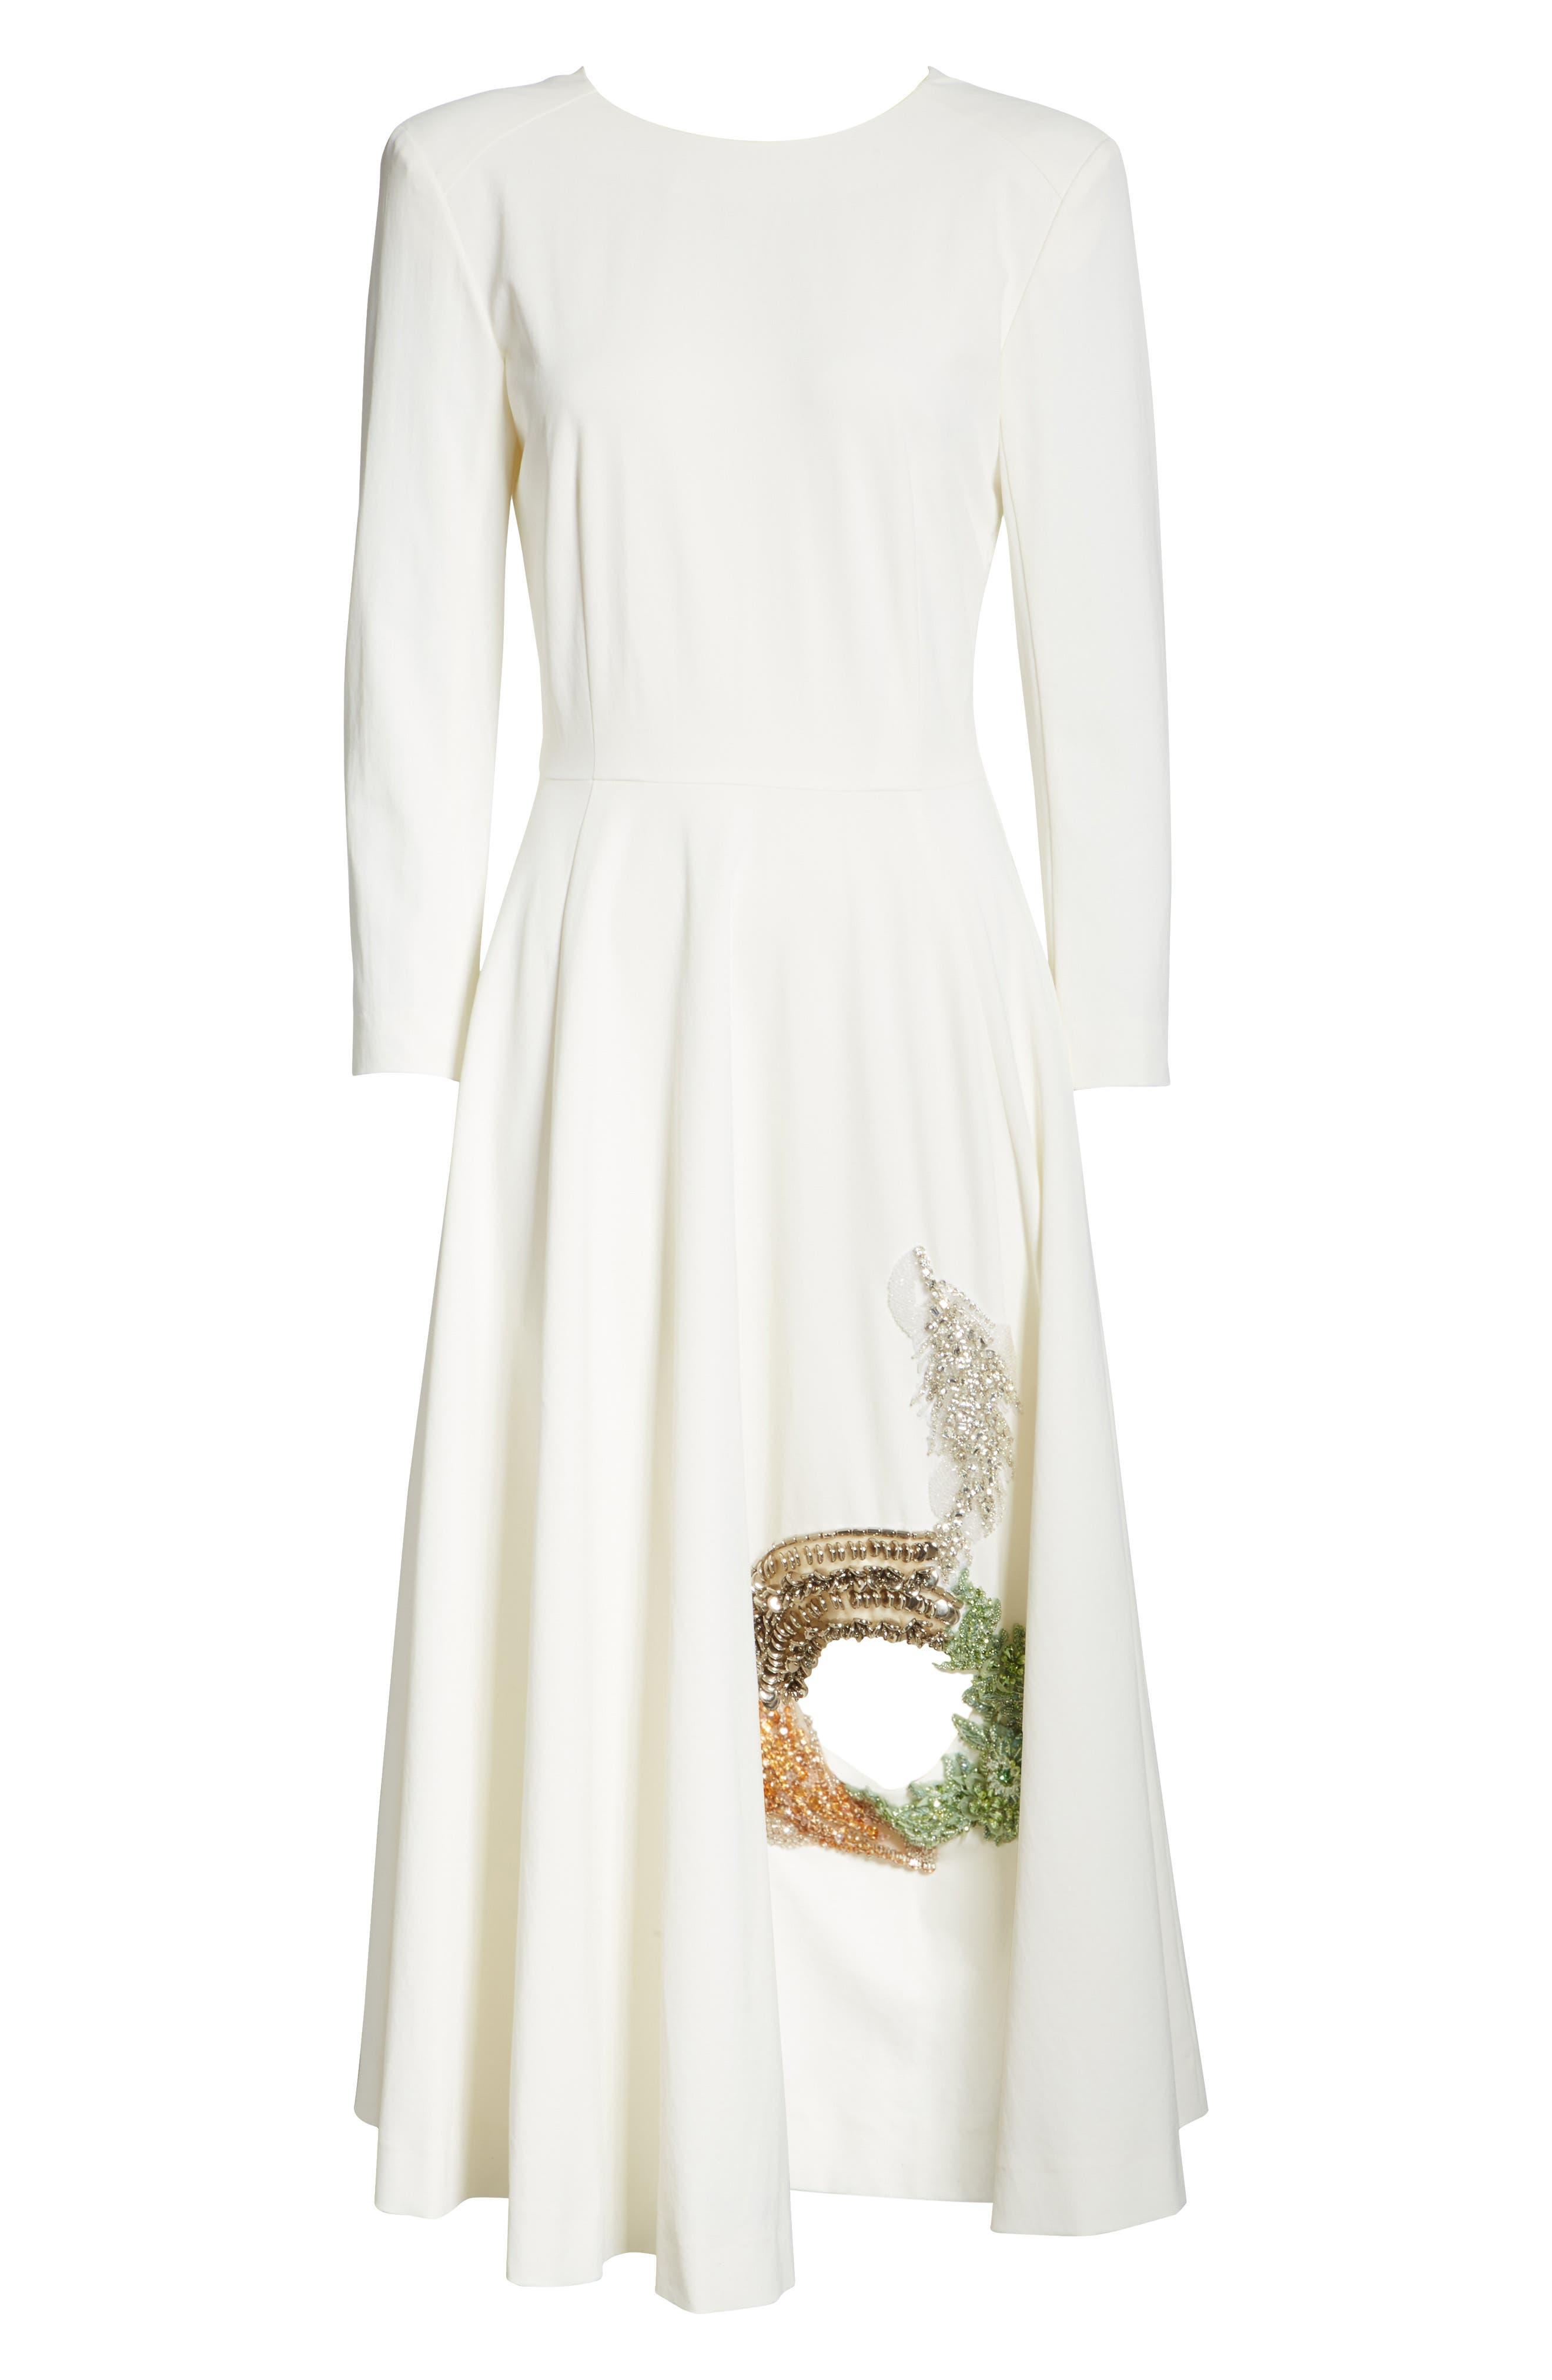 TOGA,                             Beaded Keyhole Dress,                             Alternate thumbnail 8, color,                             100